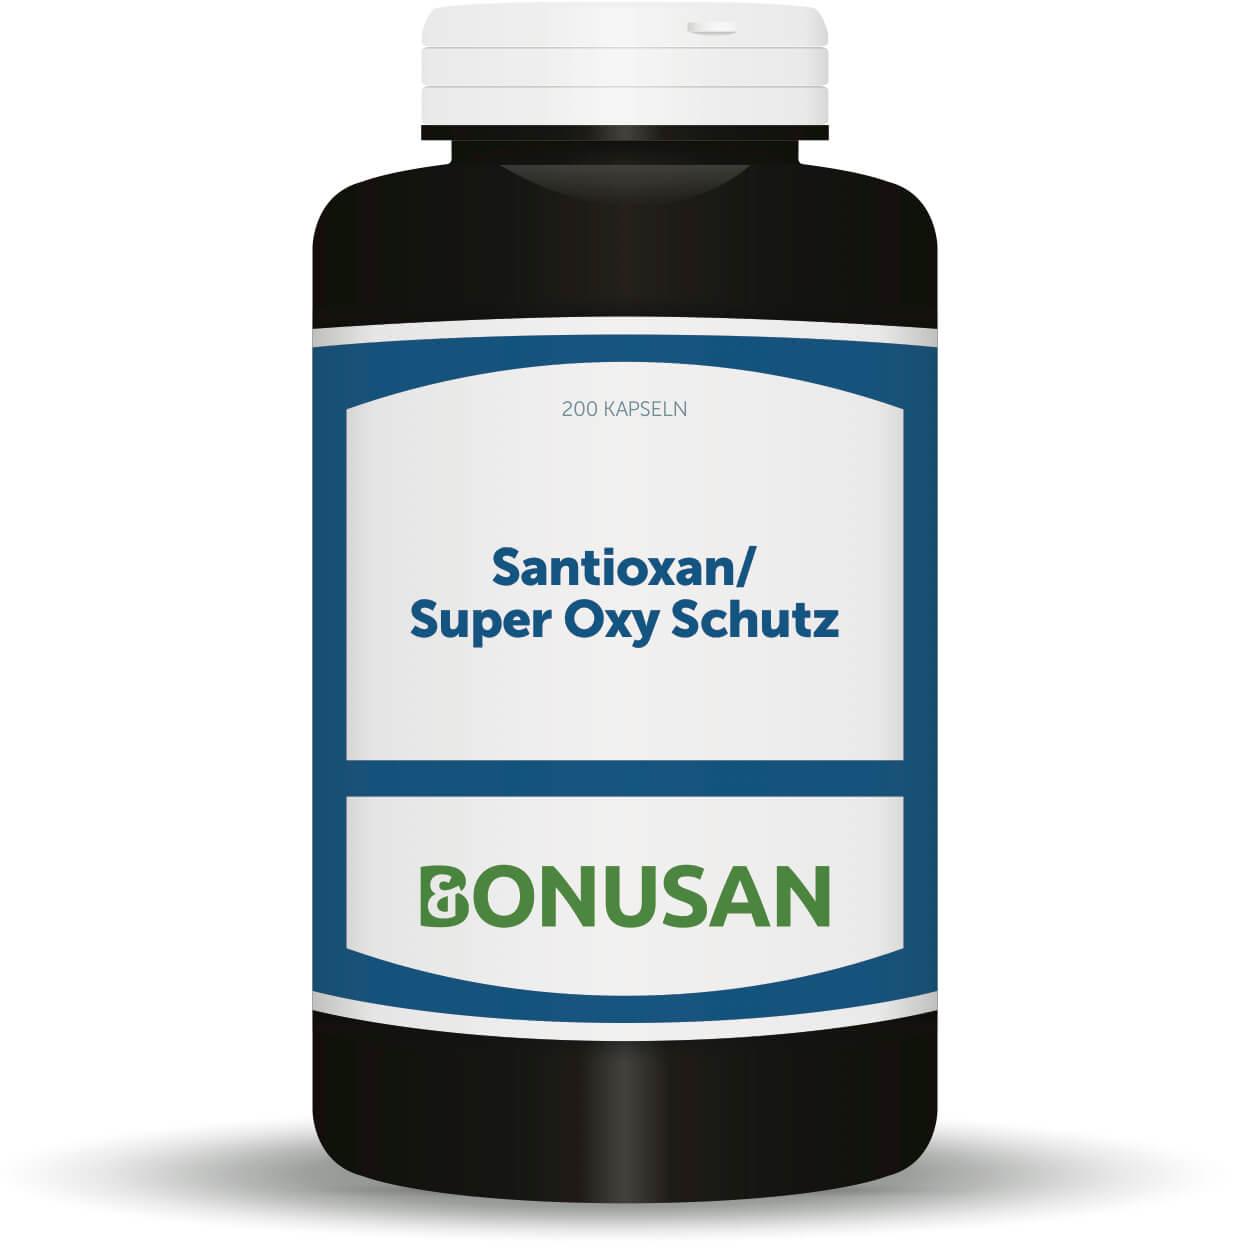 Santioxan/Super-Oxy-Schutz Großpackung